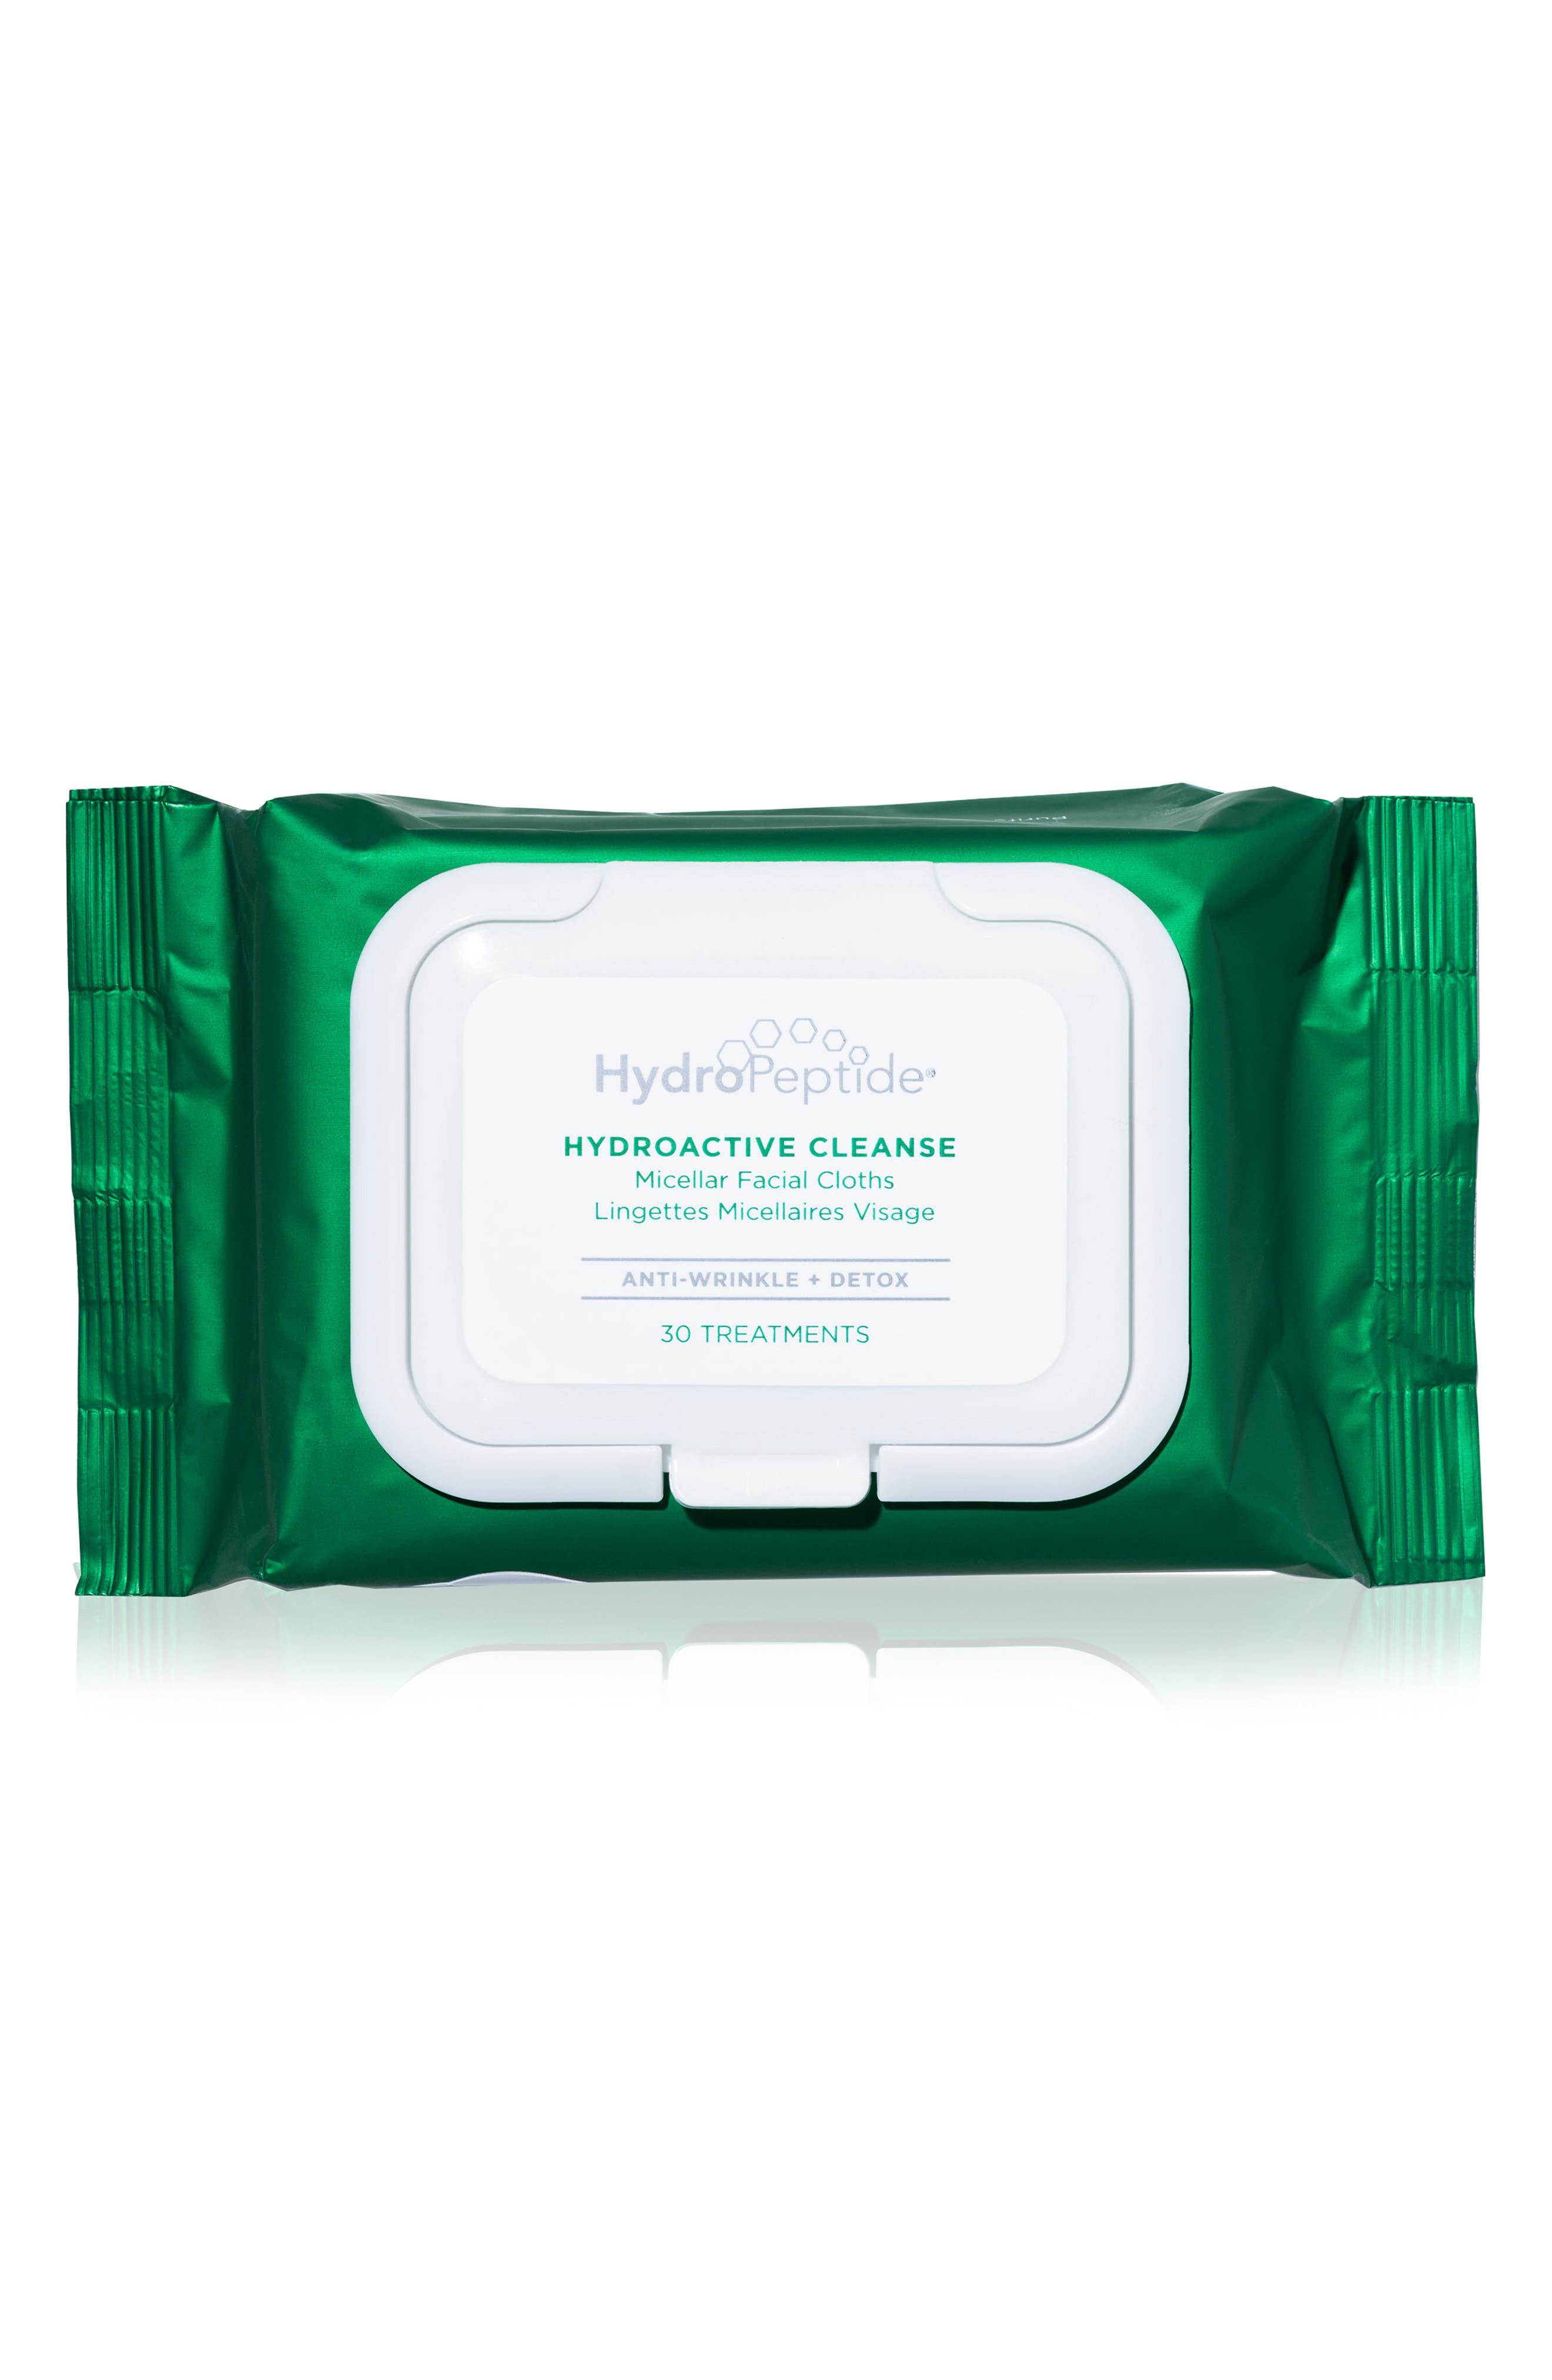 Hydroactive Cleanse Micellar Facial Cloths